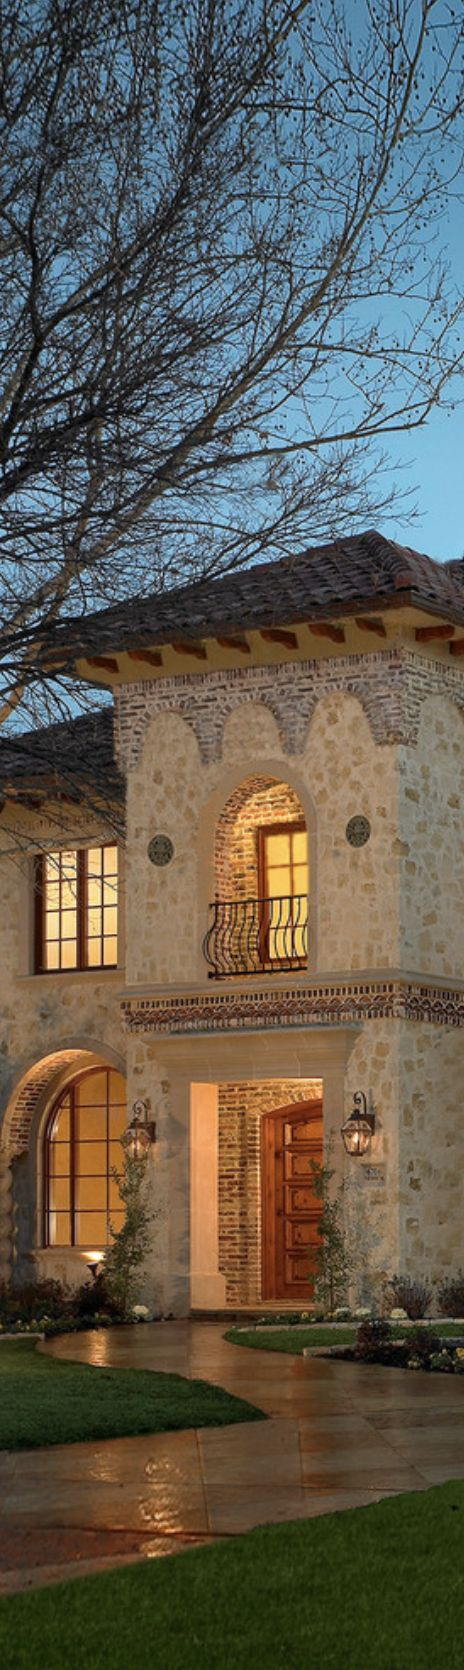 tuscan architecture stone